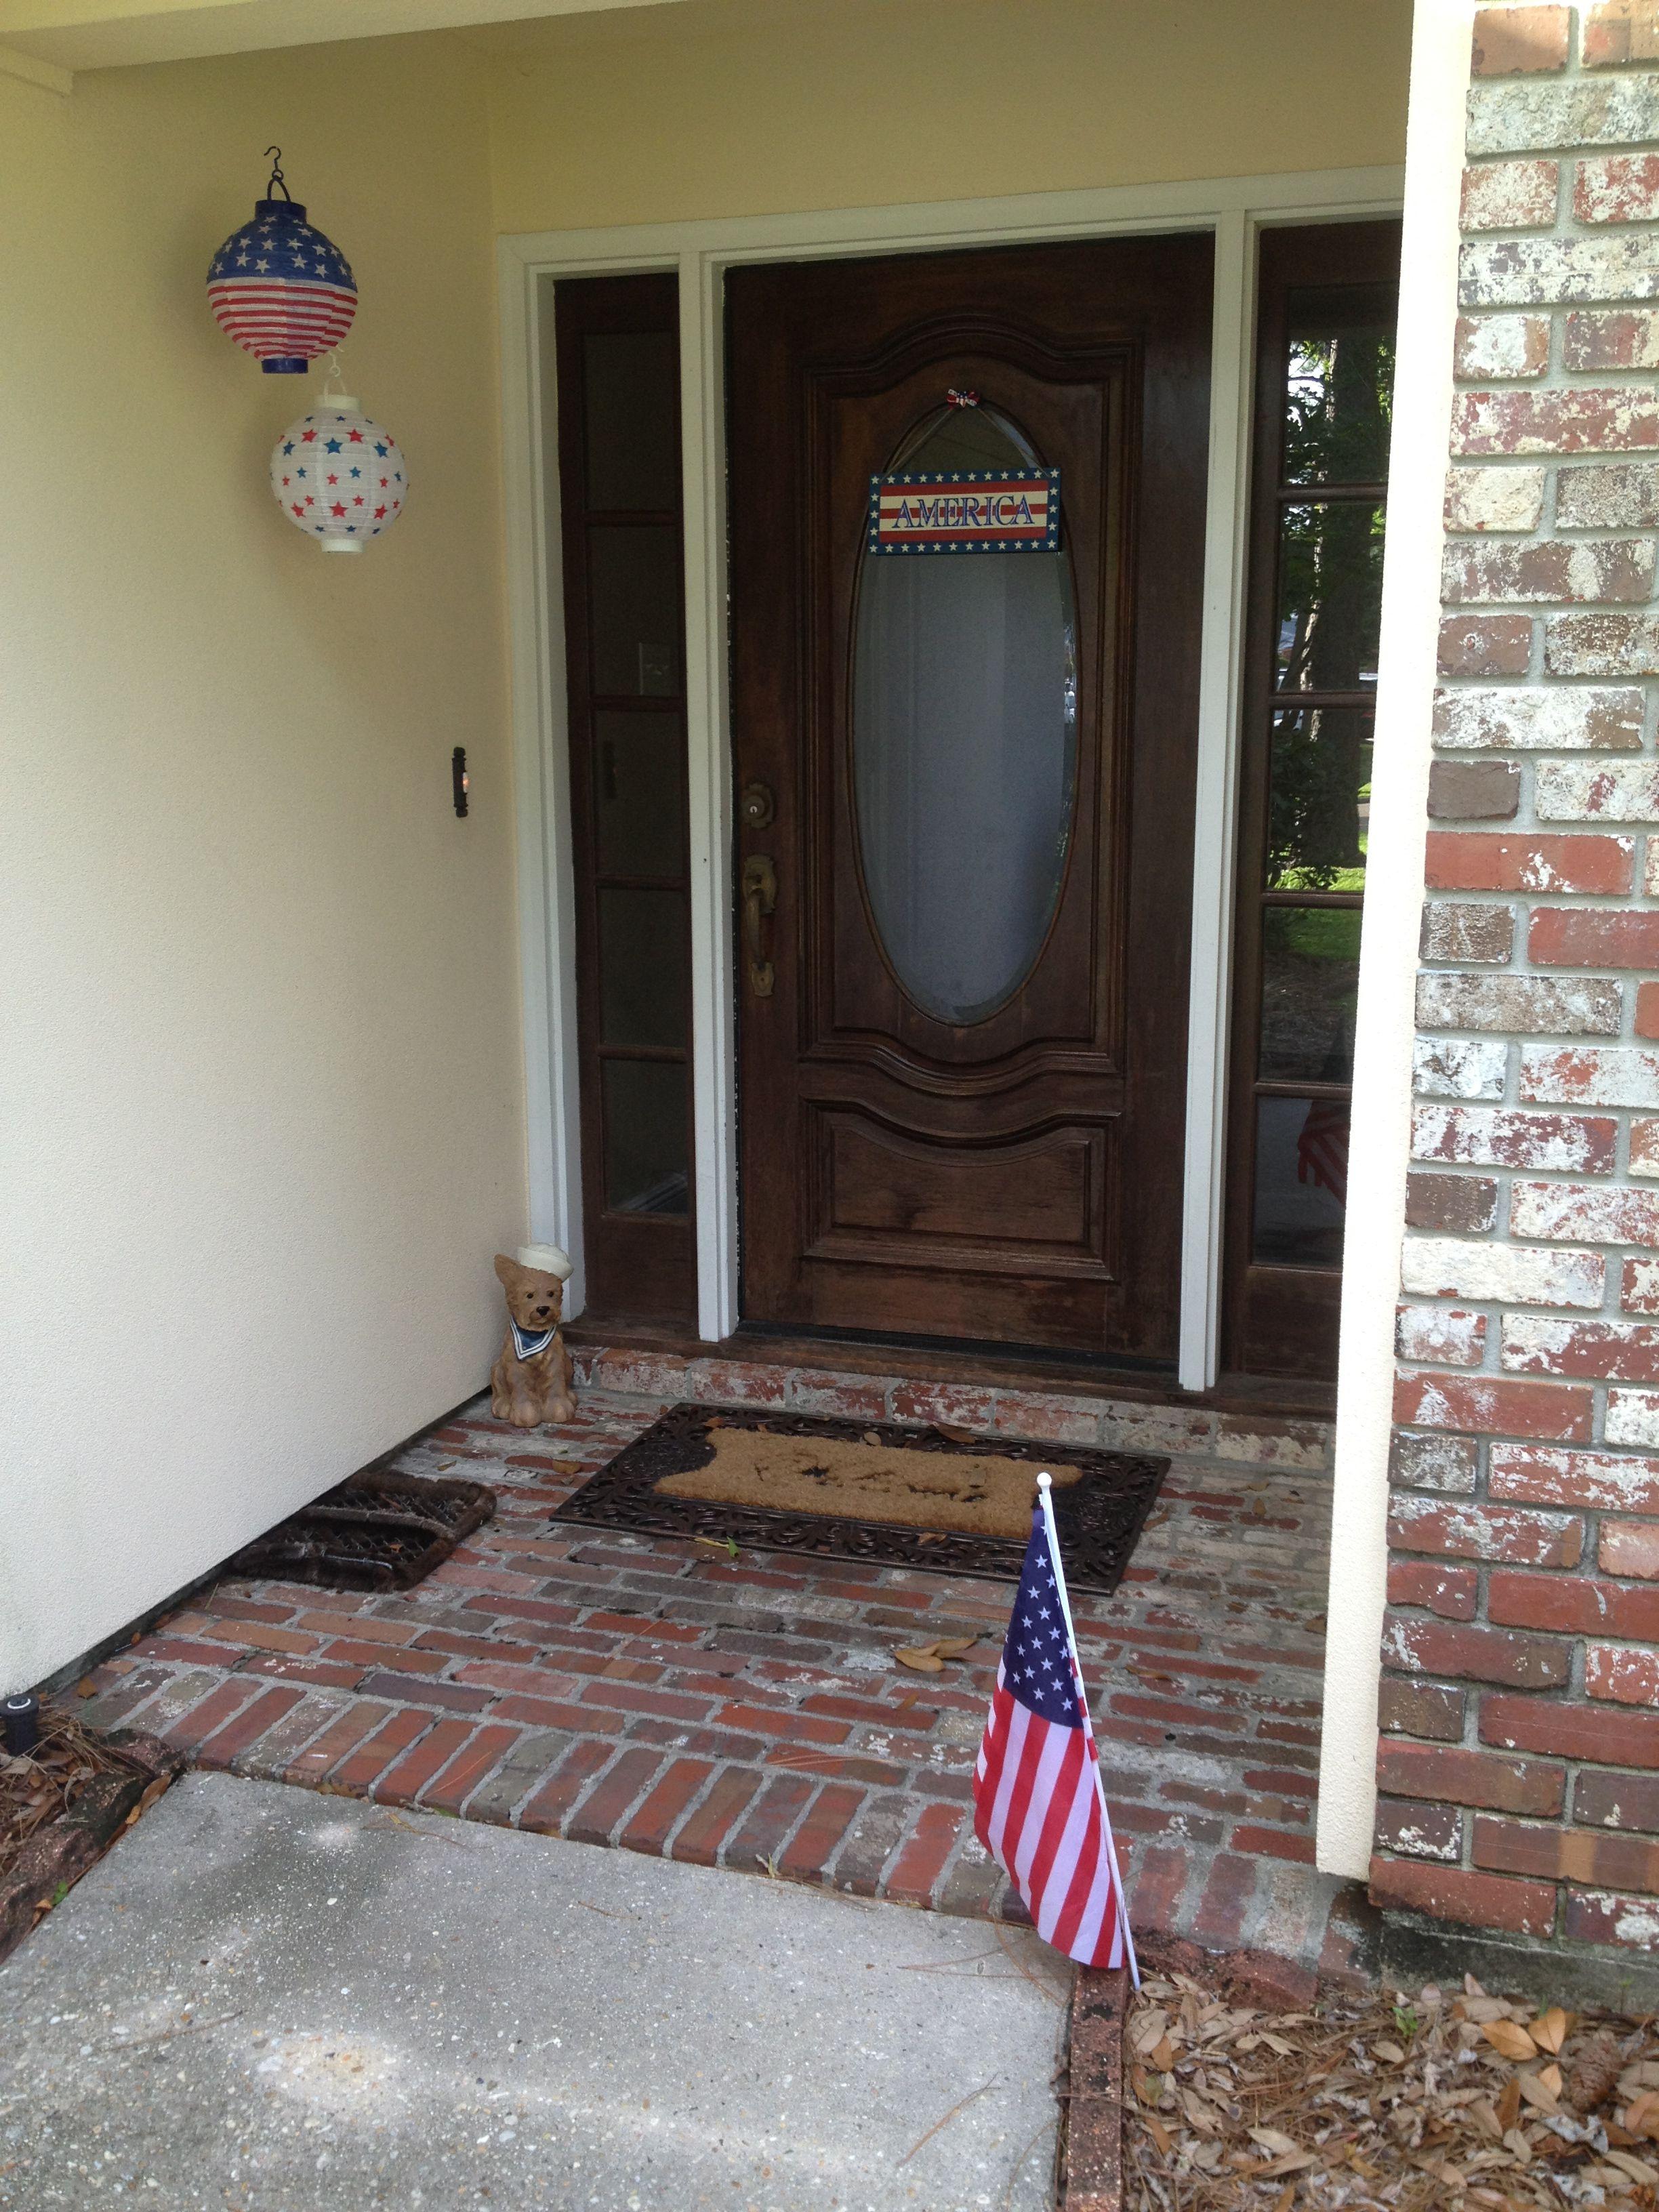 4th of July front door decor from dollar tree under $5 bucks